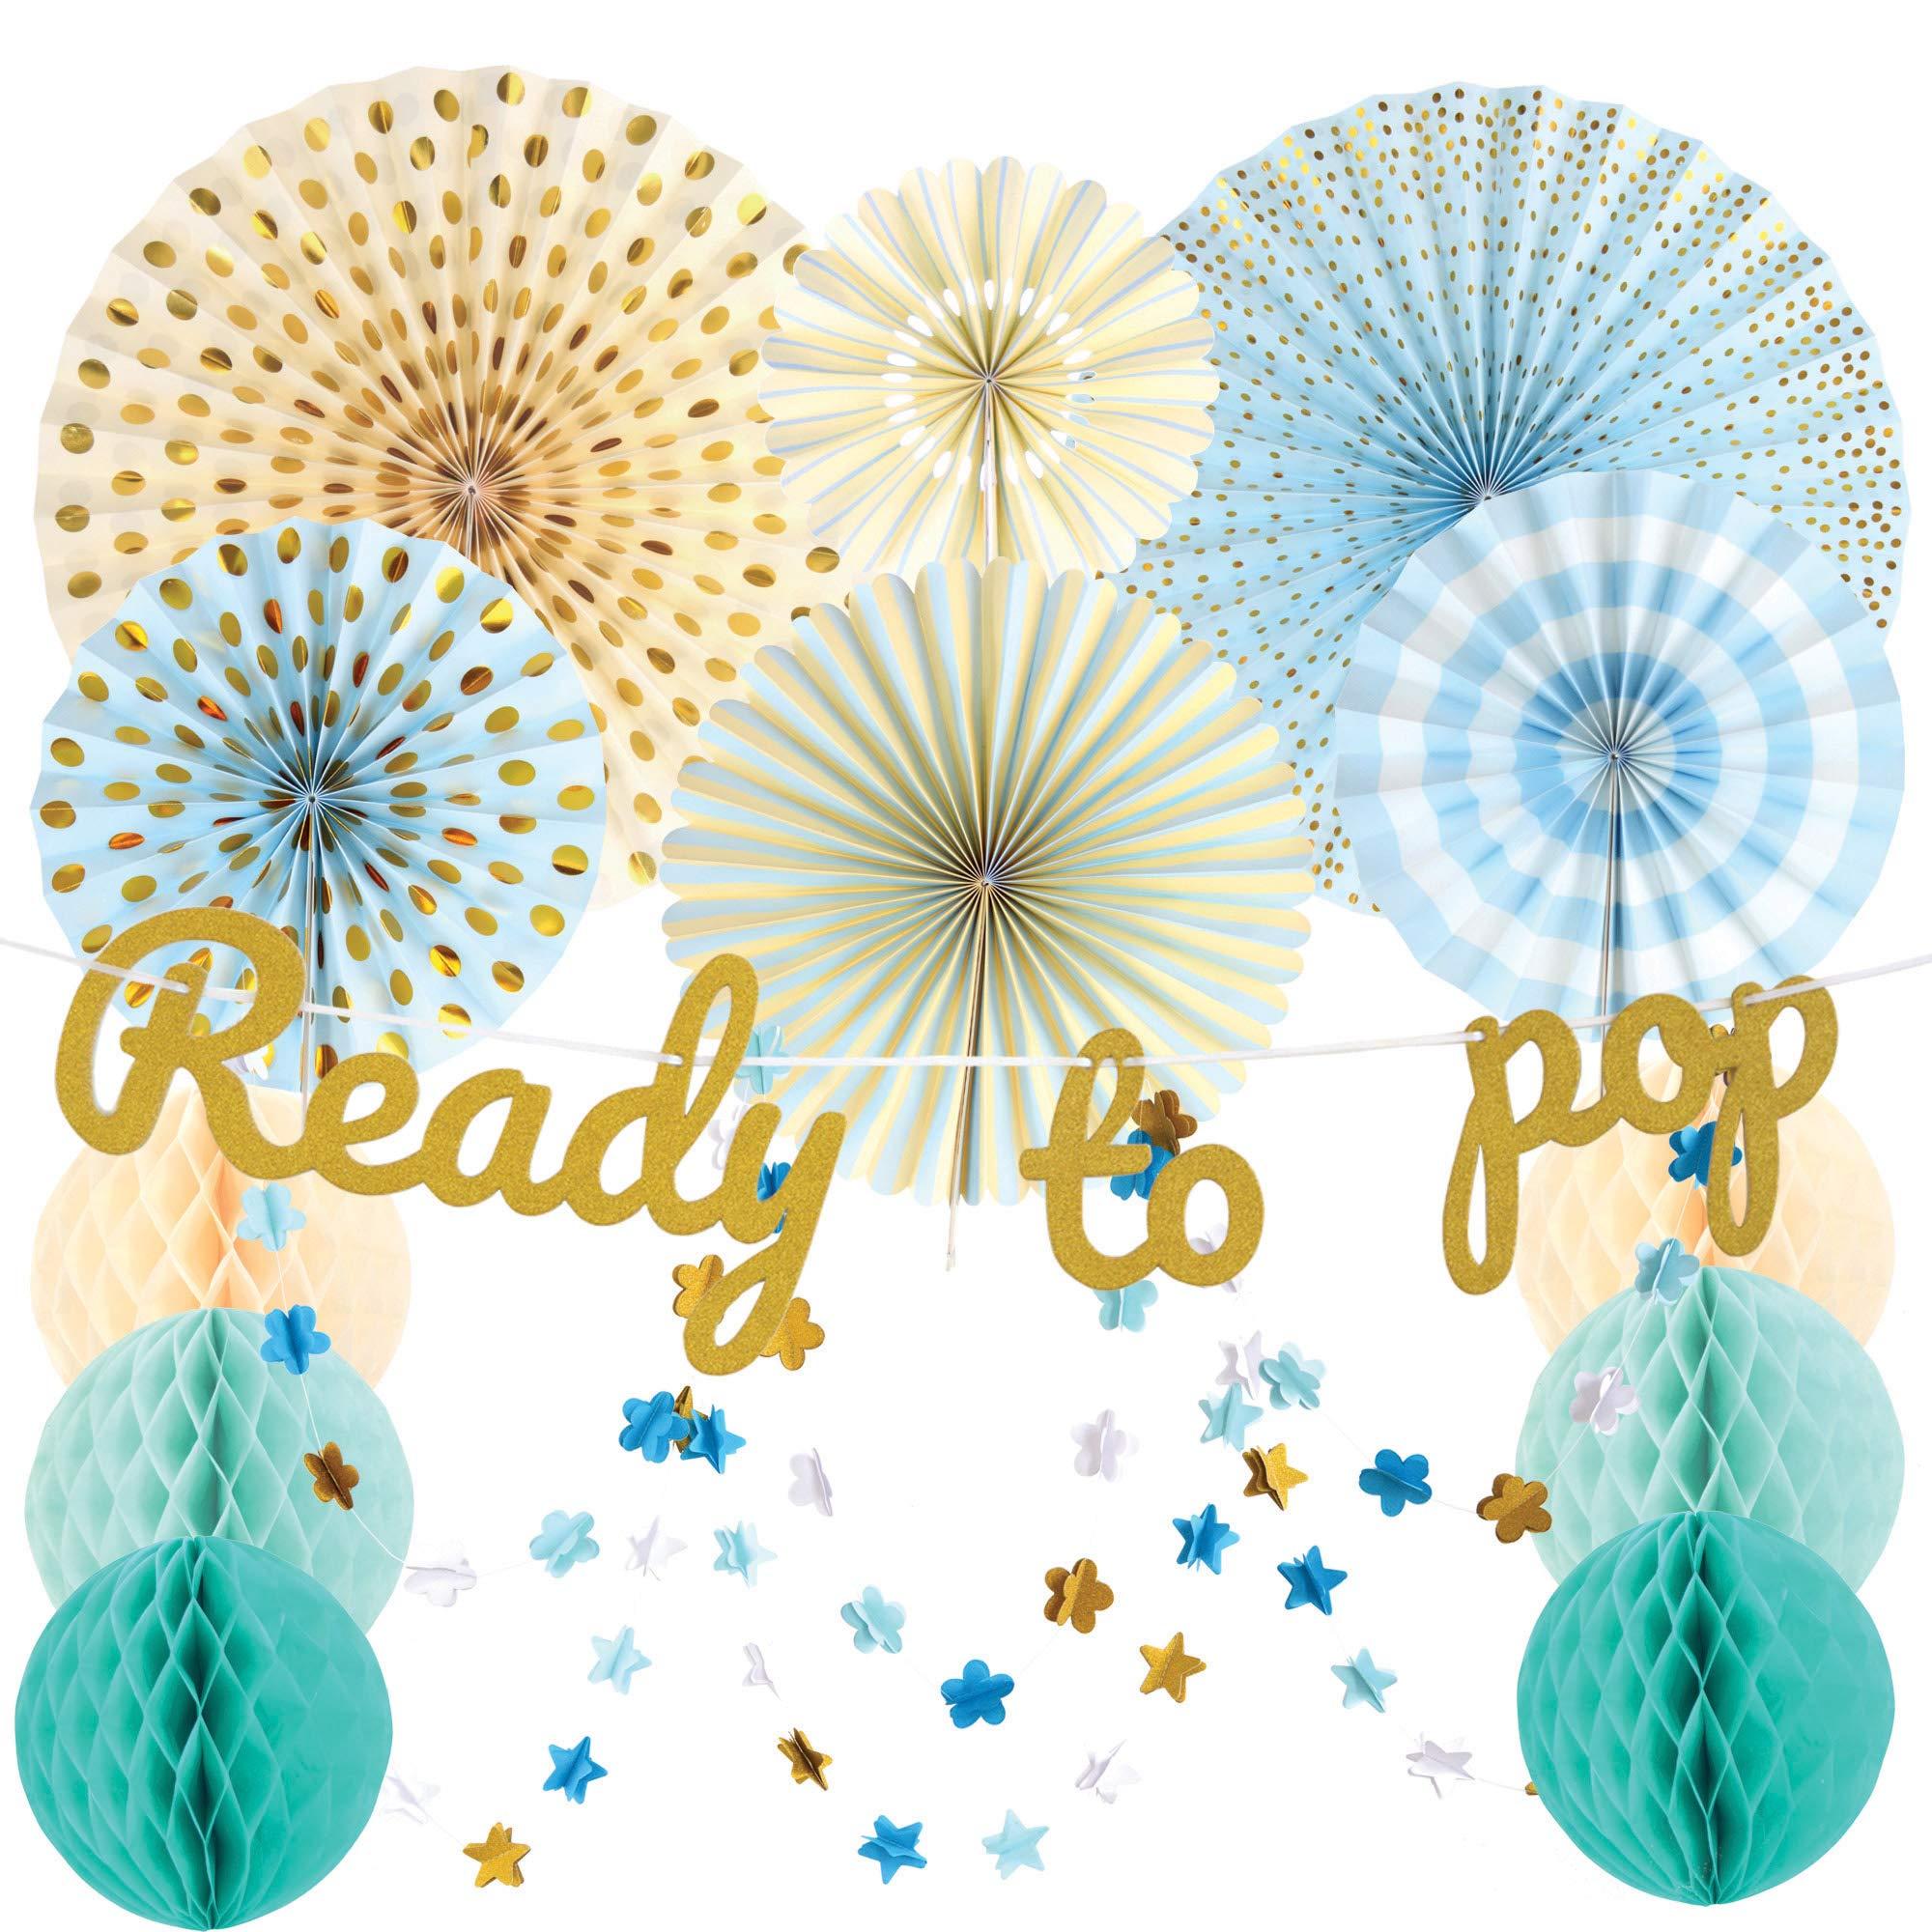 SMILING KOALA | Baby Shower Decorations for boy | Blue Baby Shower Decorations | Ready to Pop banner | Paper Fans | Honeycomb Balls | Garlands | baby shower boy | Party Decorations | Boy baby shower decorations